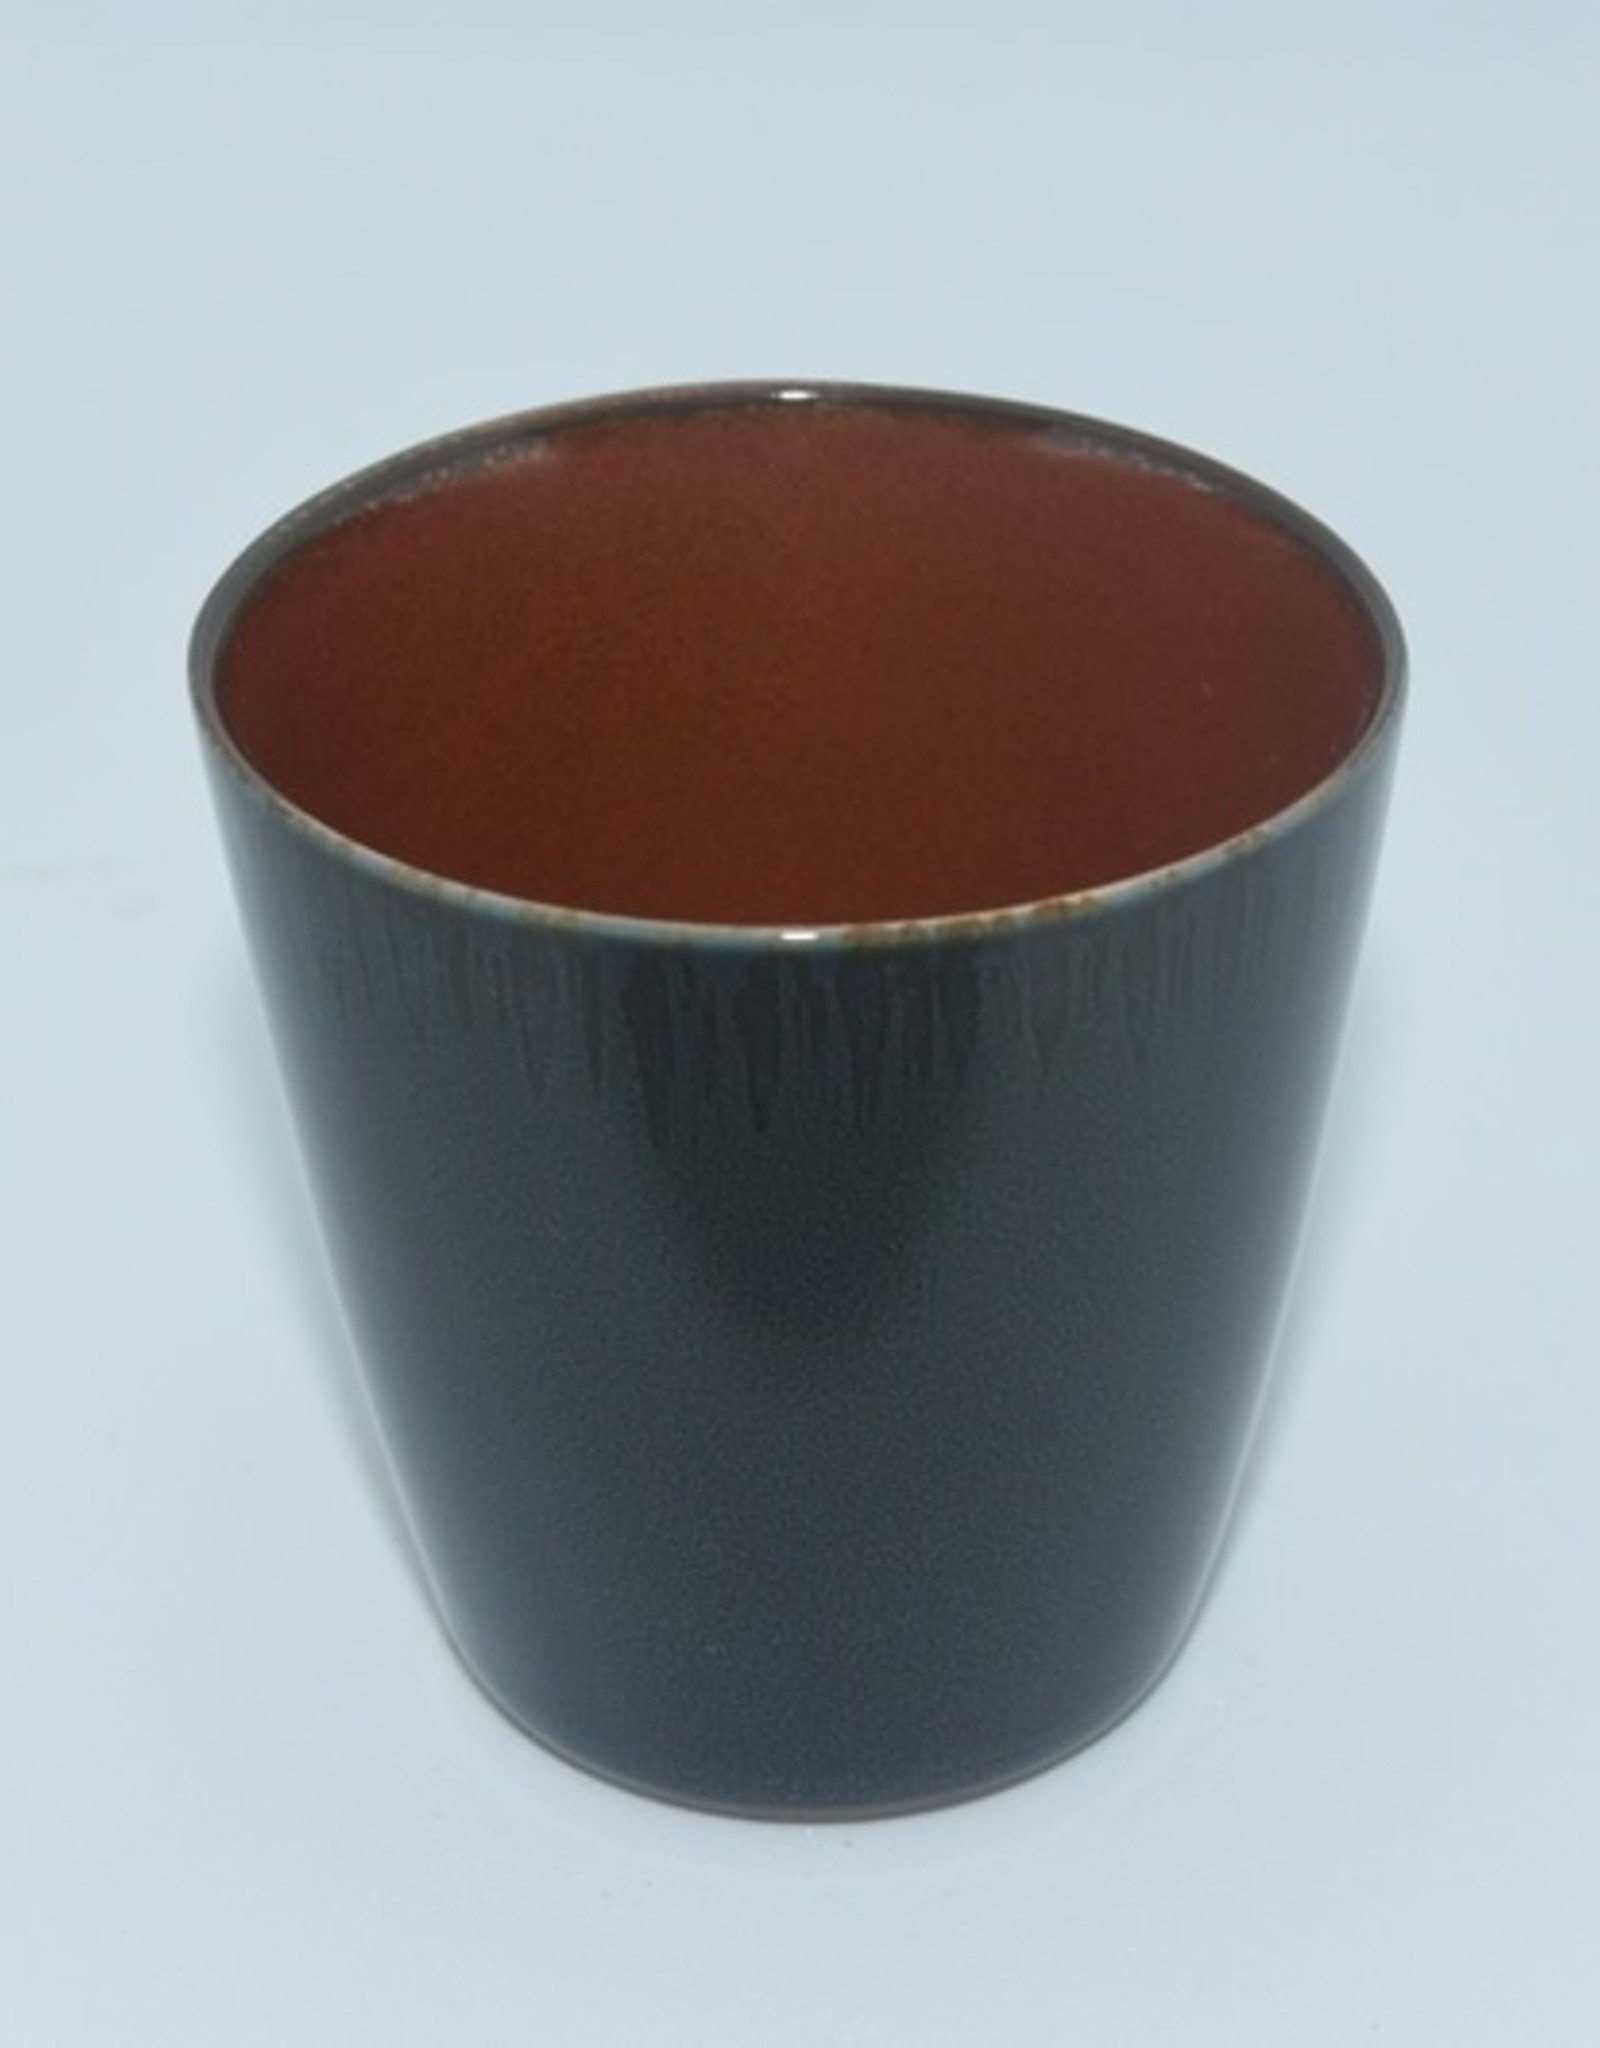 Serax Beker koffie 7 cm Anita Le Grelle / Serax